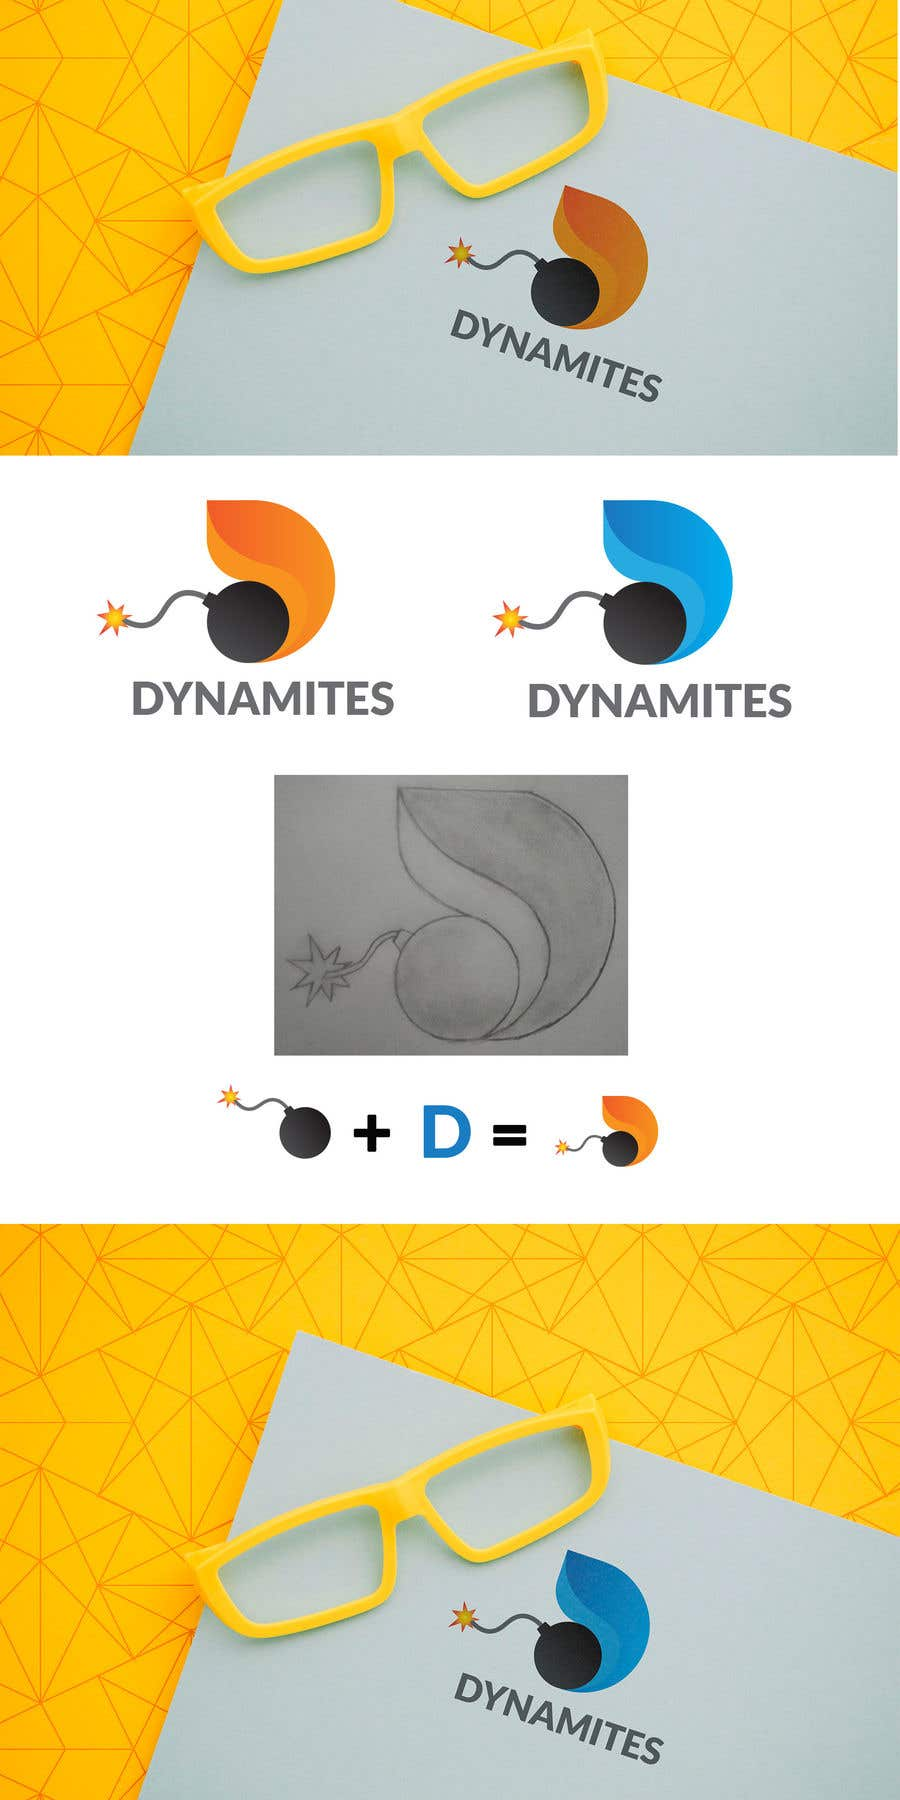 Bài tham dự cuộc thi #111 cho Team Logo - Dynamites